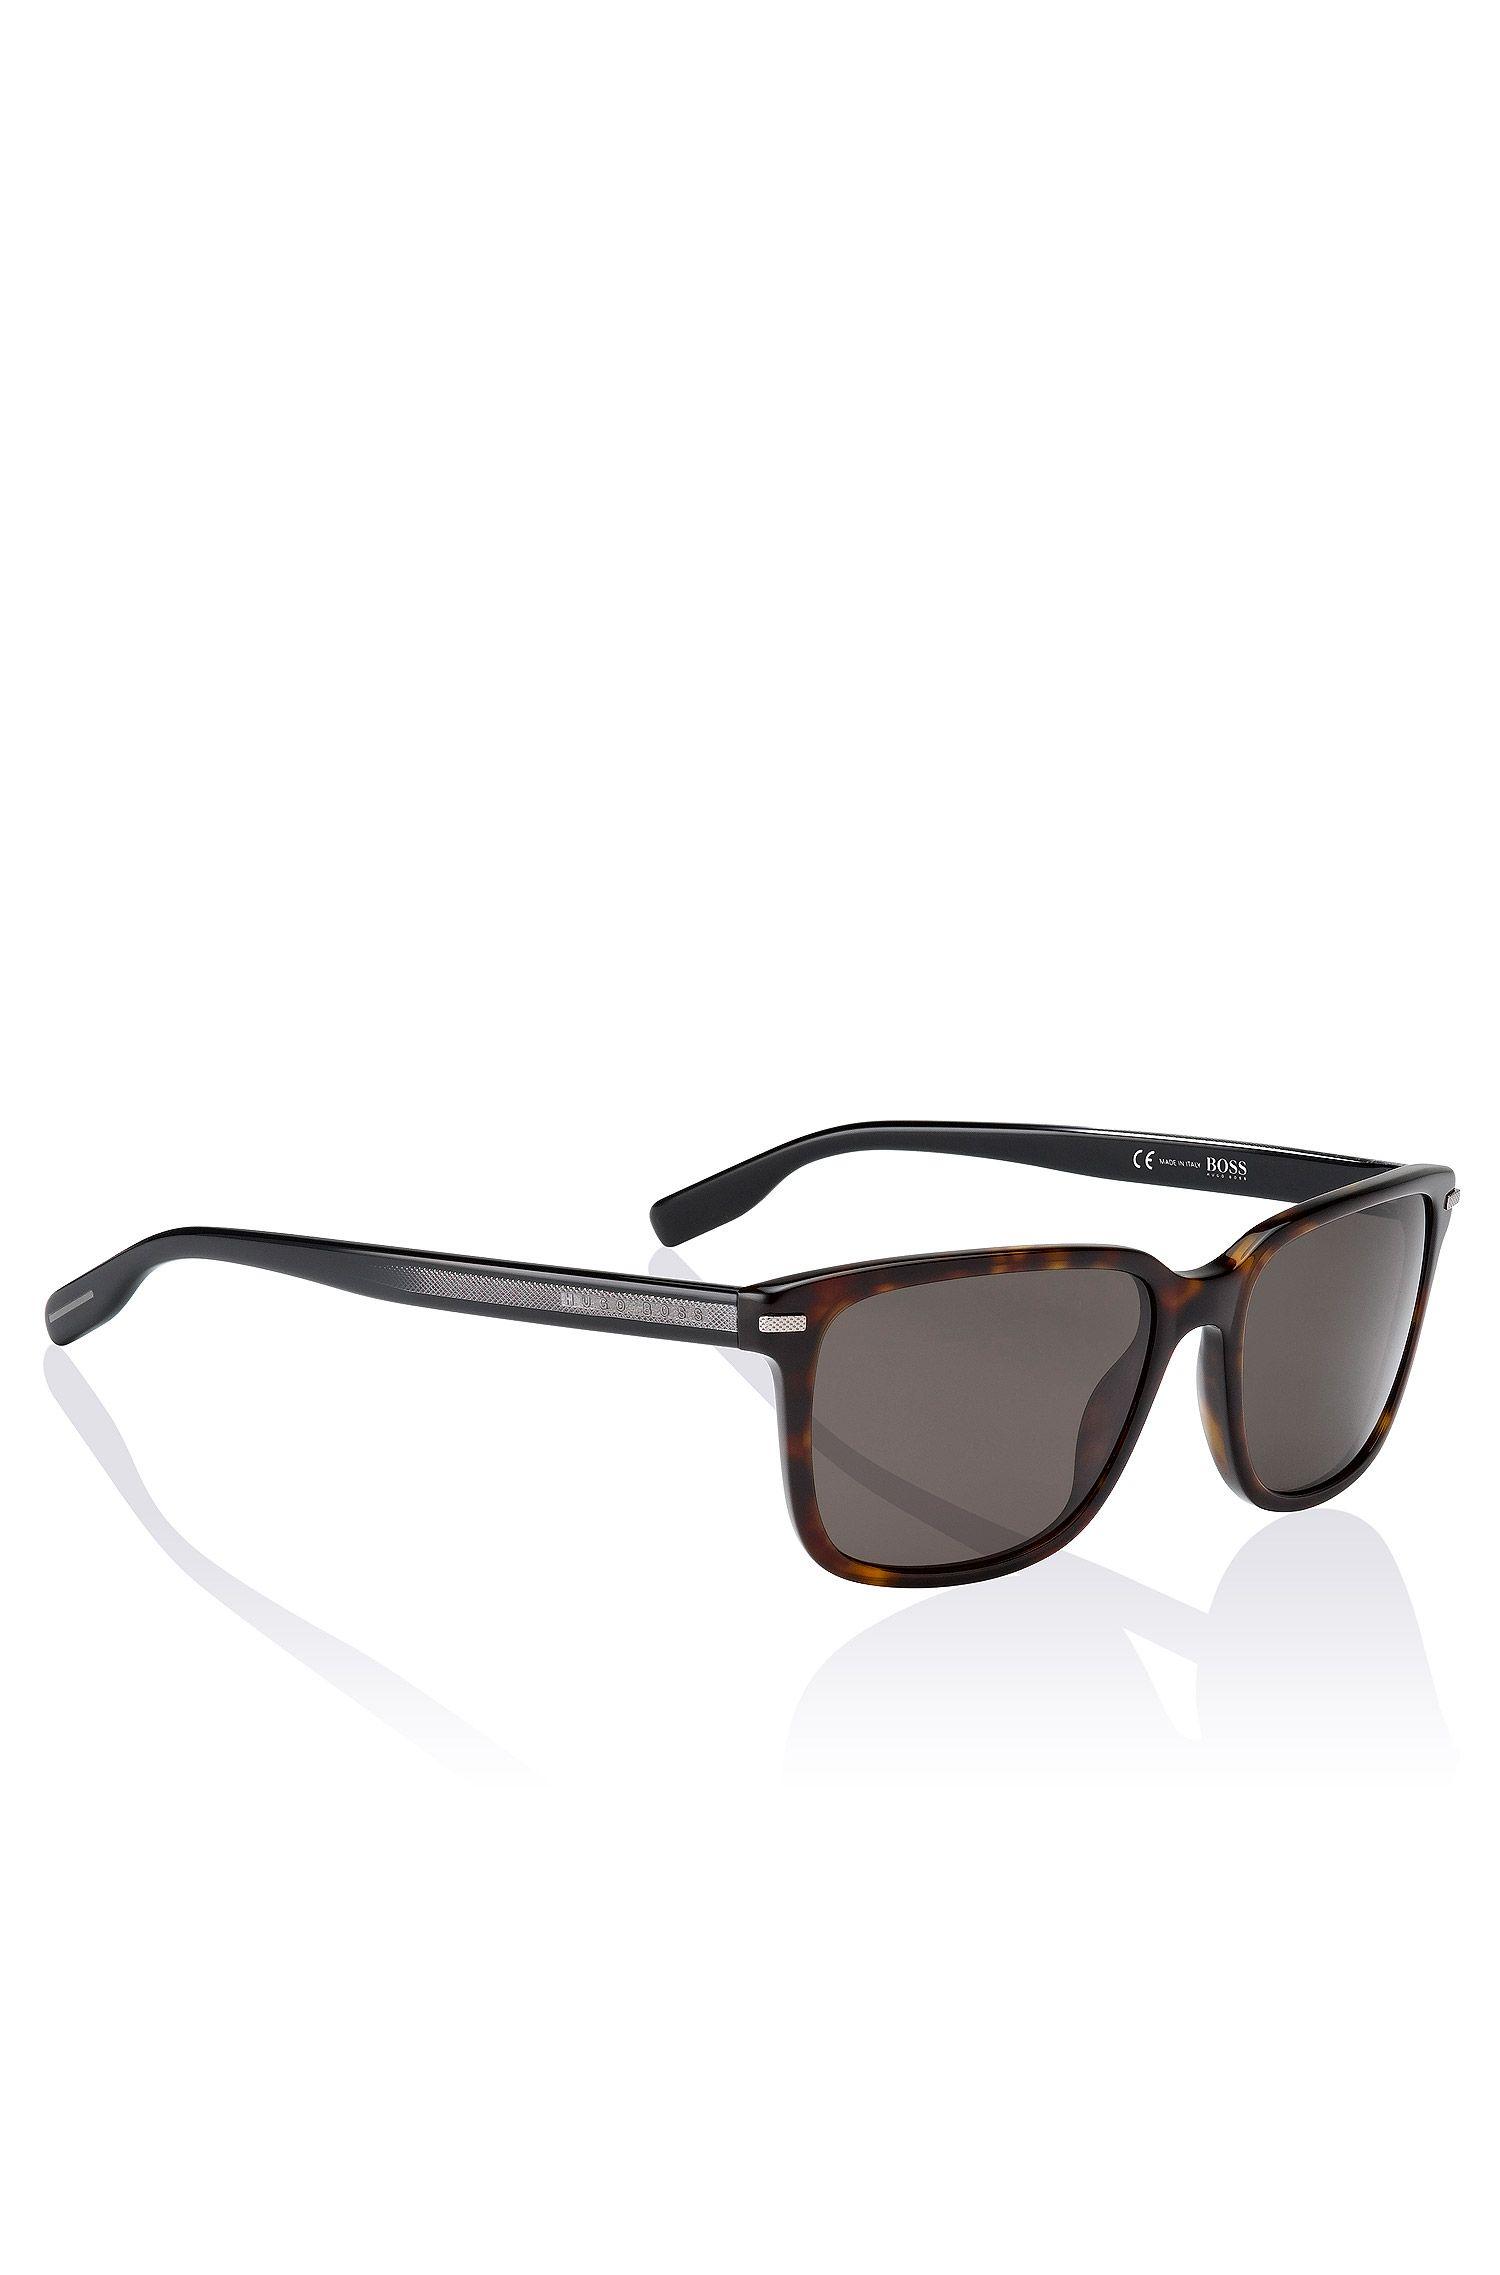 Sonnenbrille ´BOSS 0623/S`